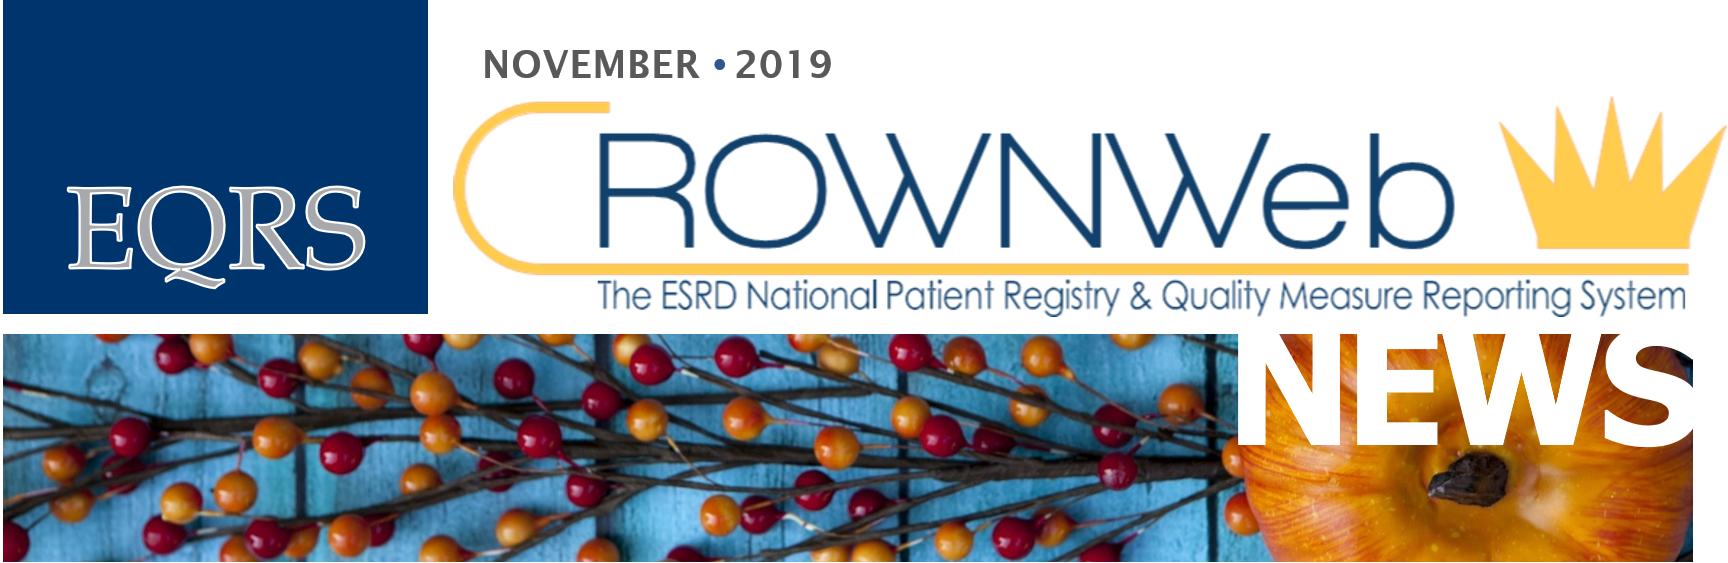 November 2019 CROWNWeb News